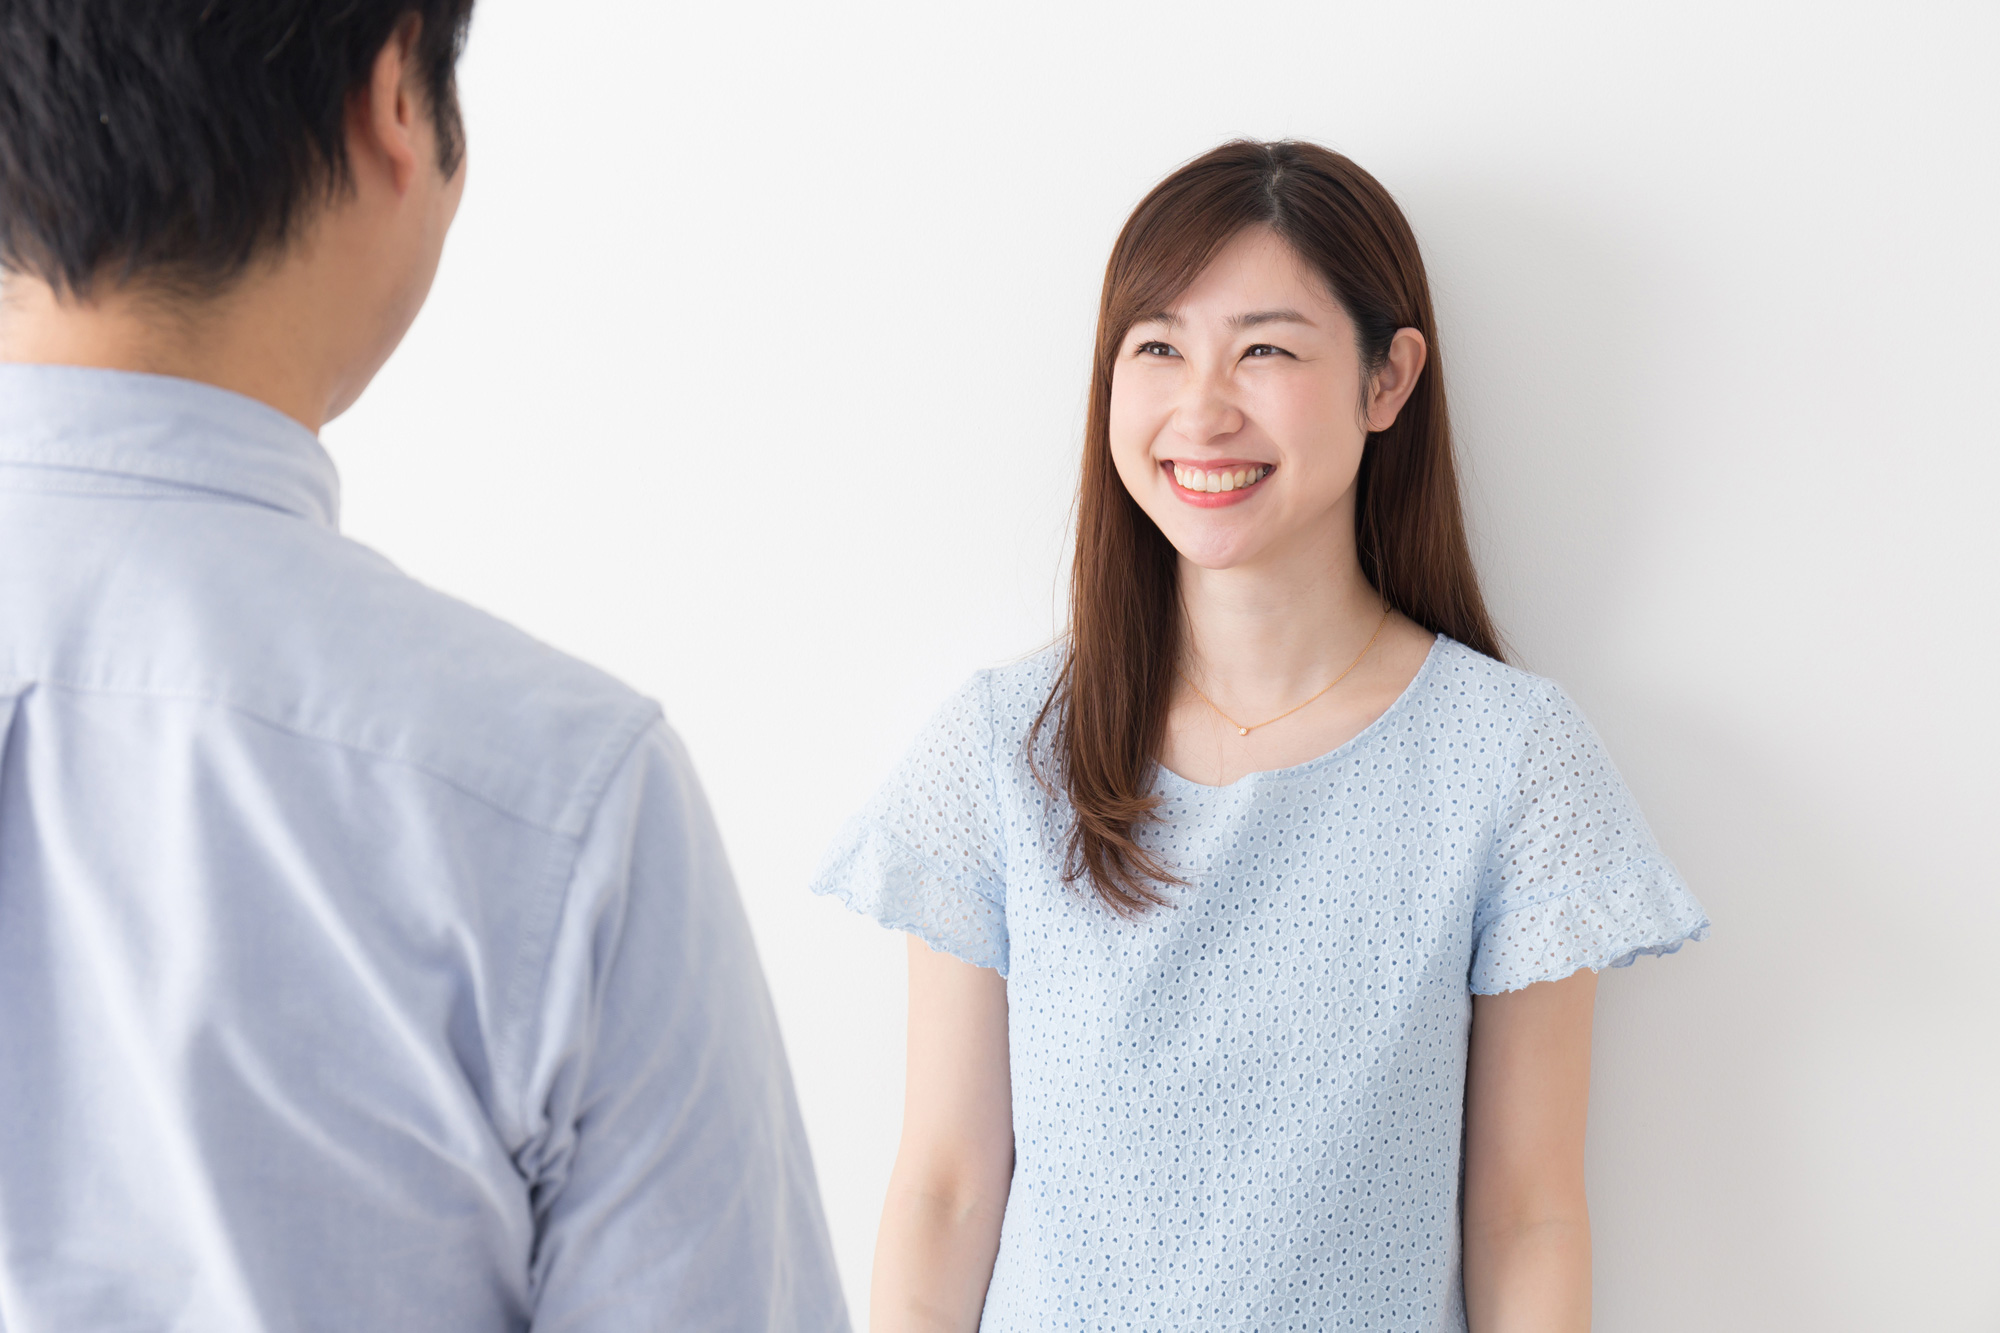 ATM夫としての結婚生活を嫌悪する男性